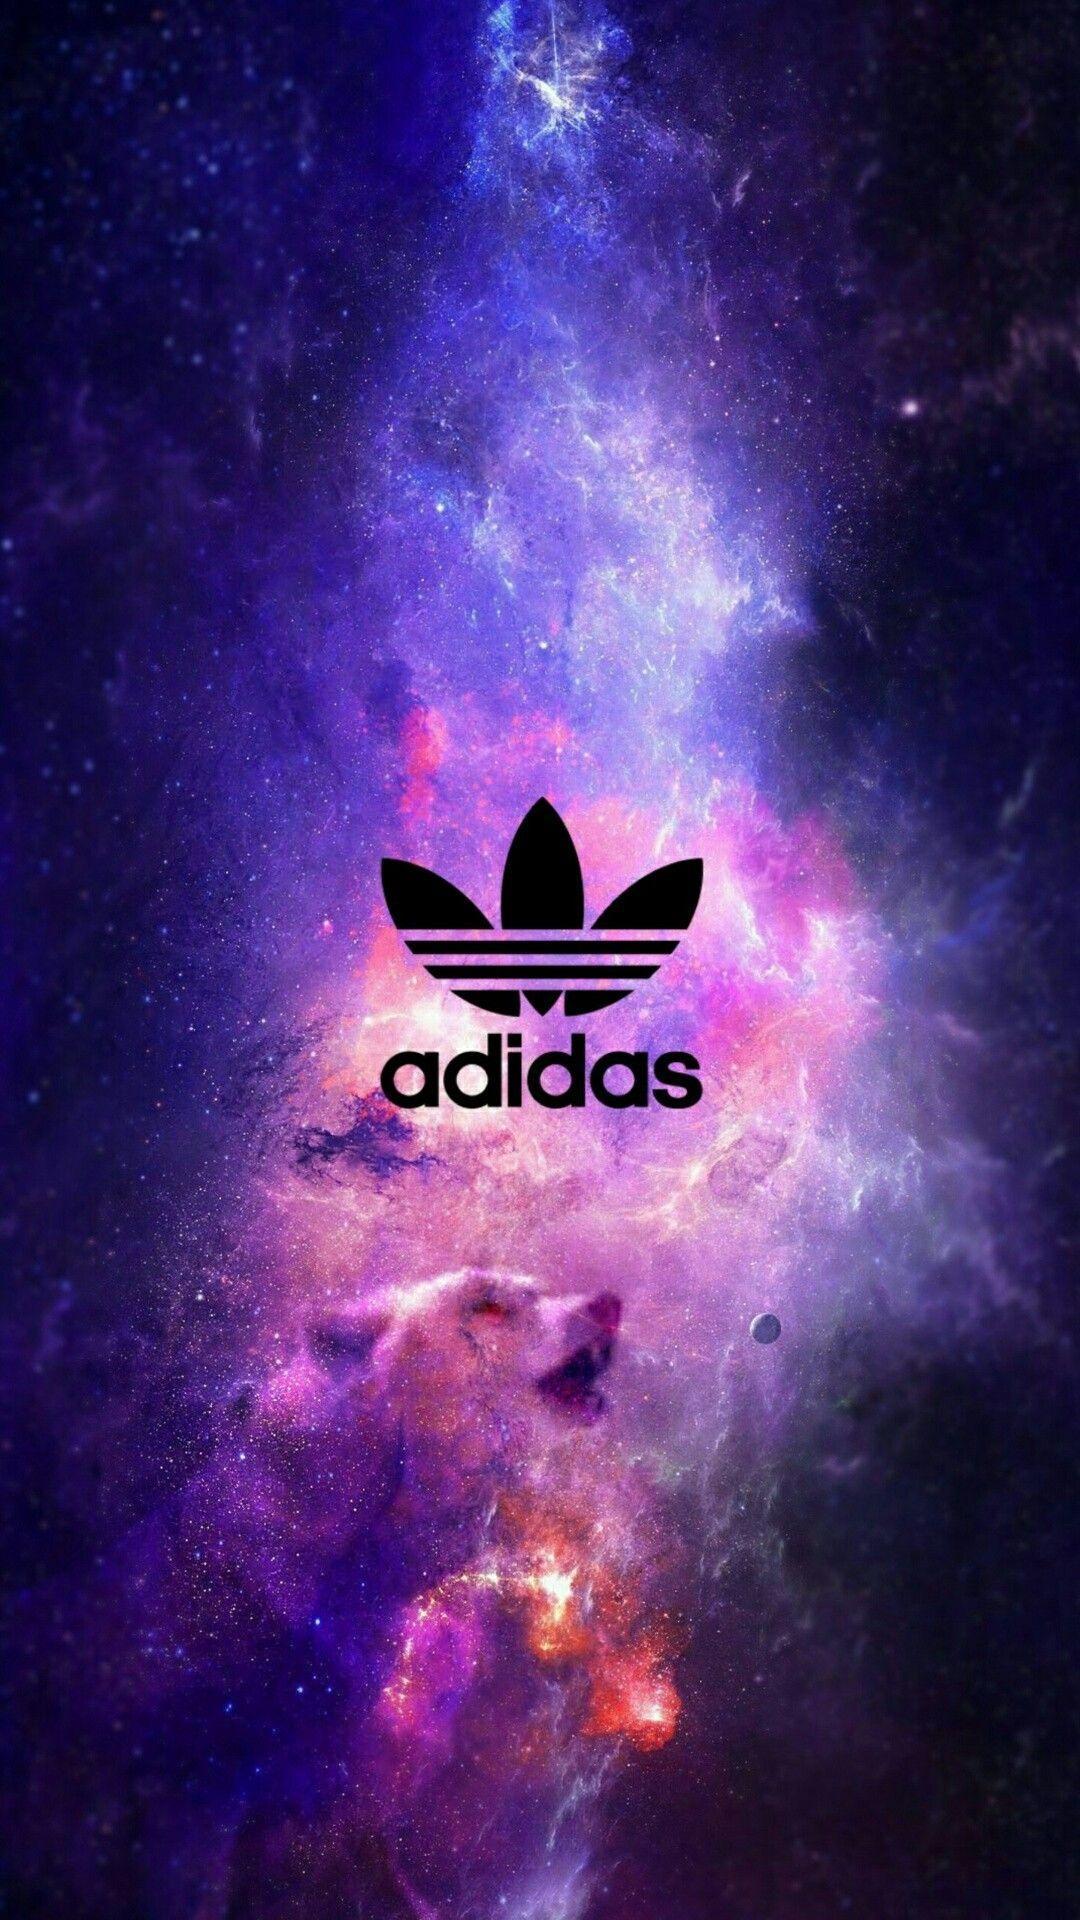 Sfondi adidas 4k